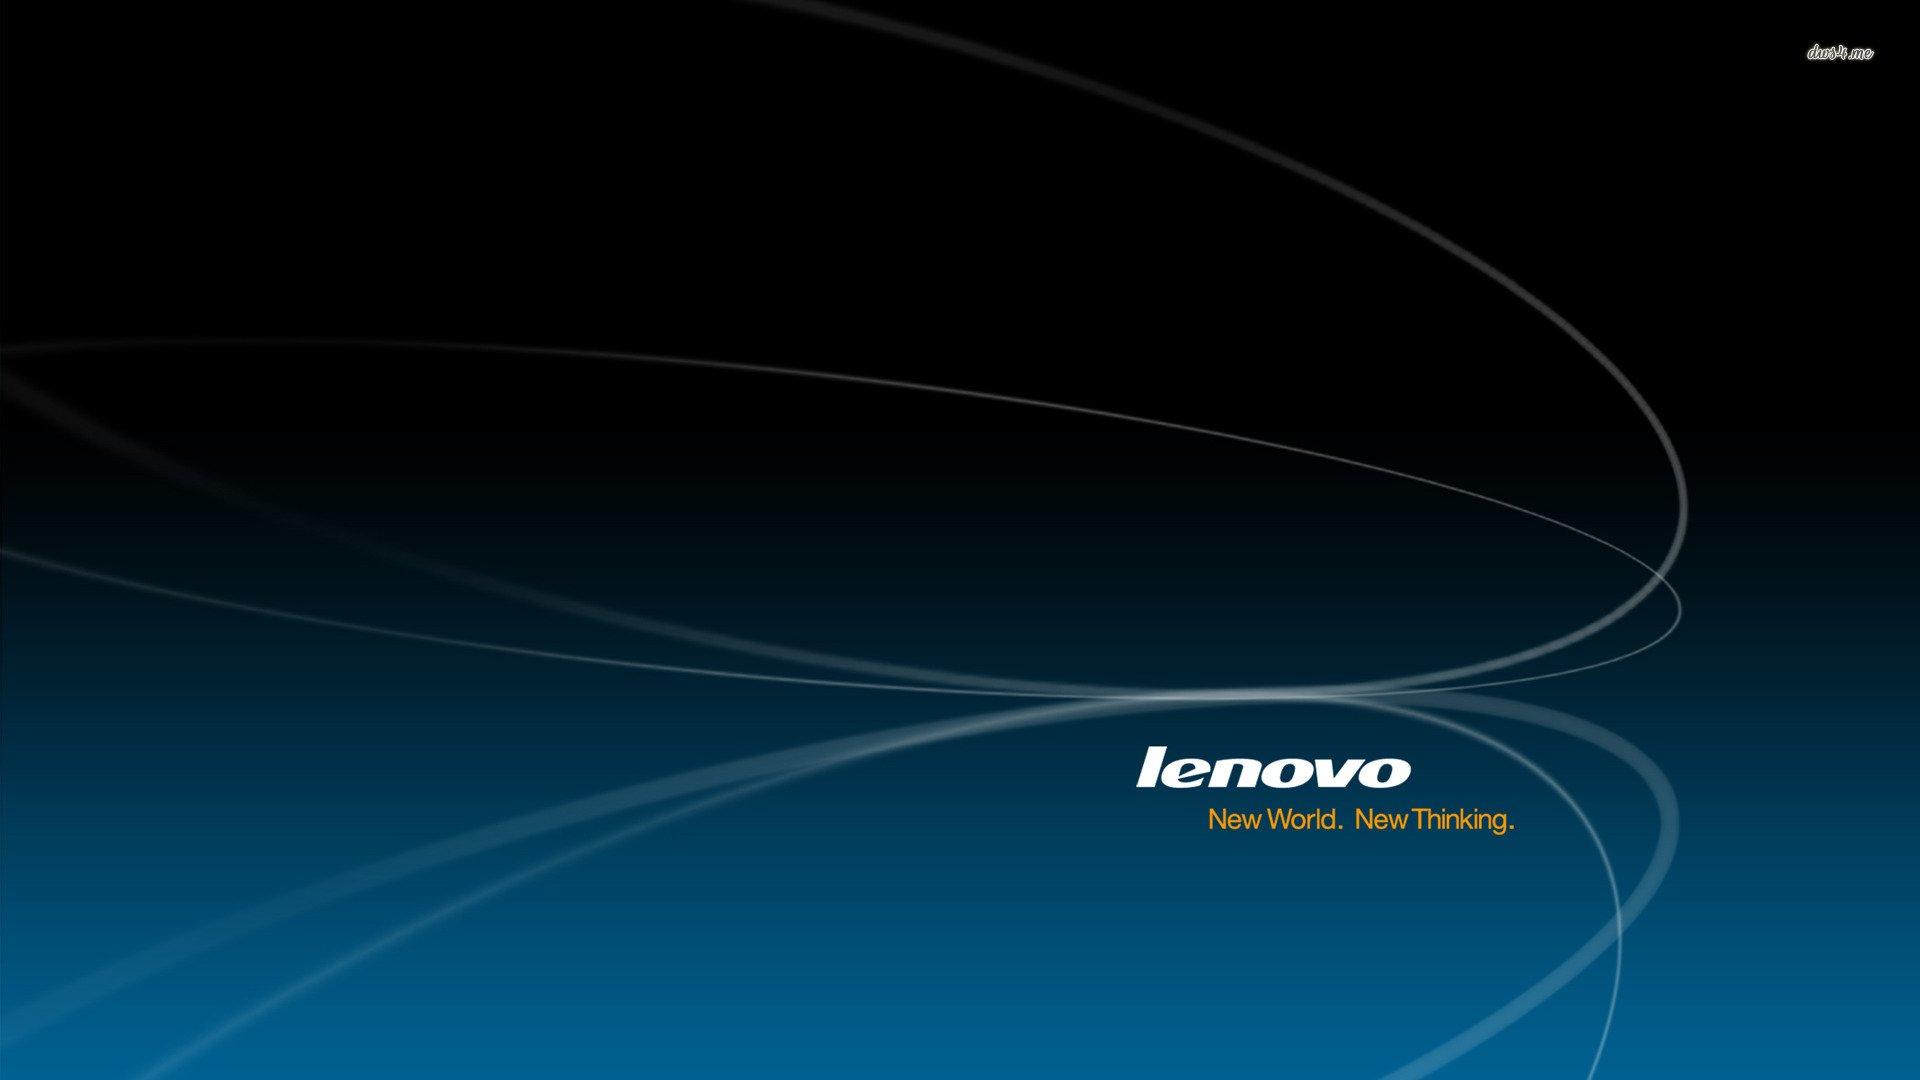 Lenovo wallpaper 1920x1080 51345 1920x1080